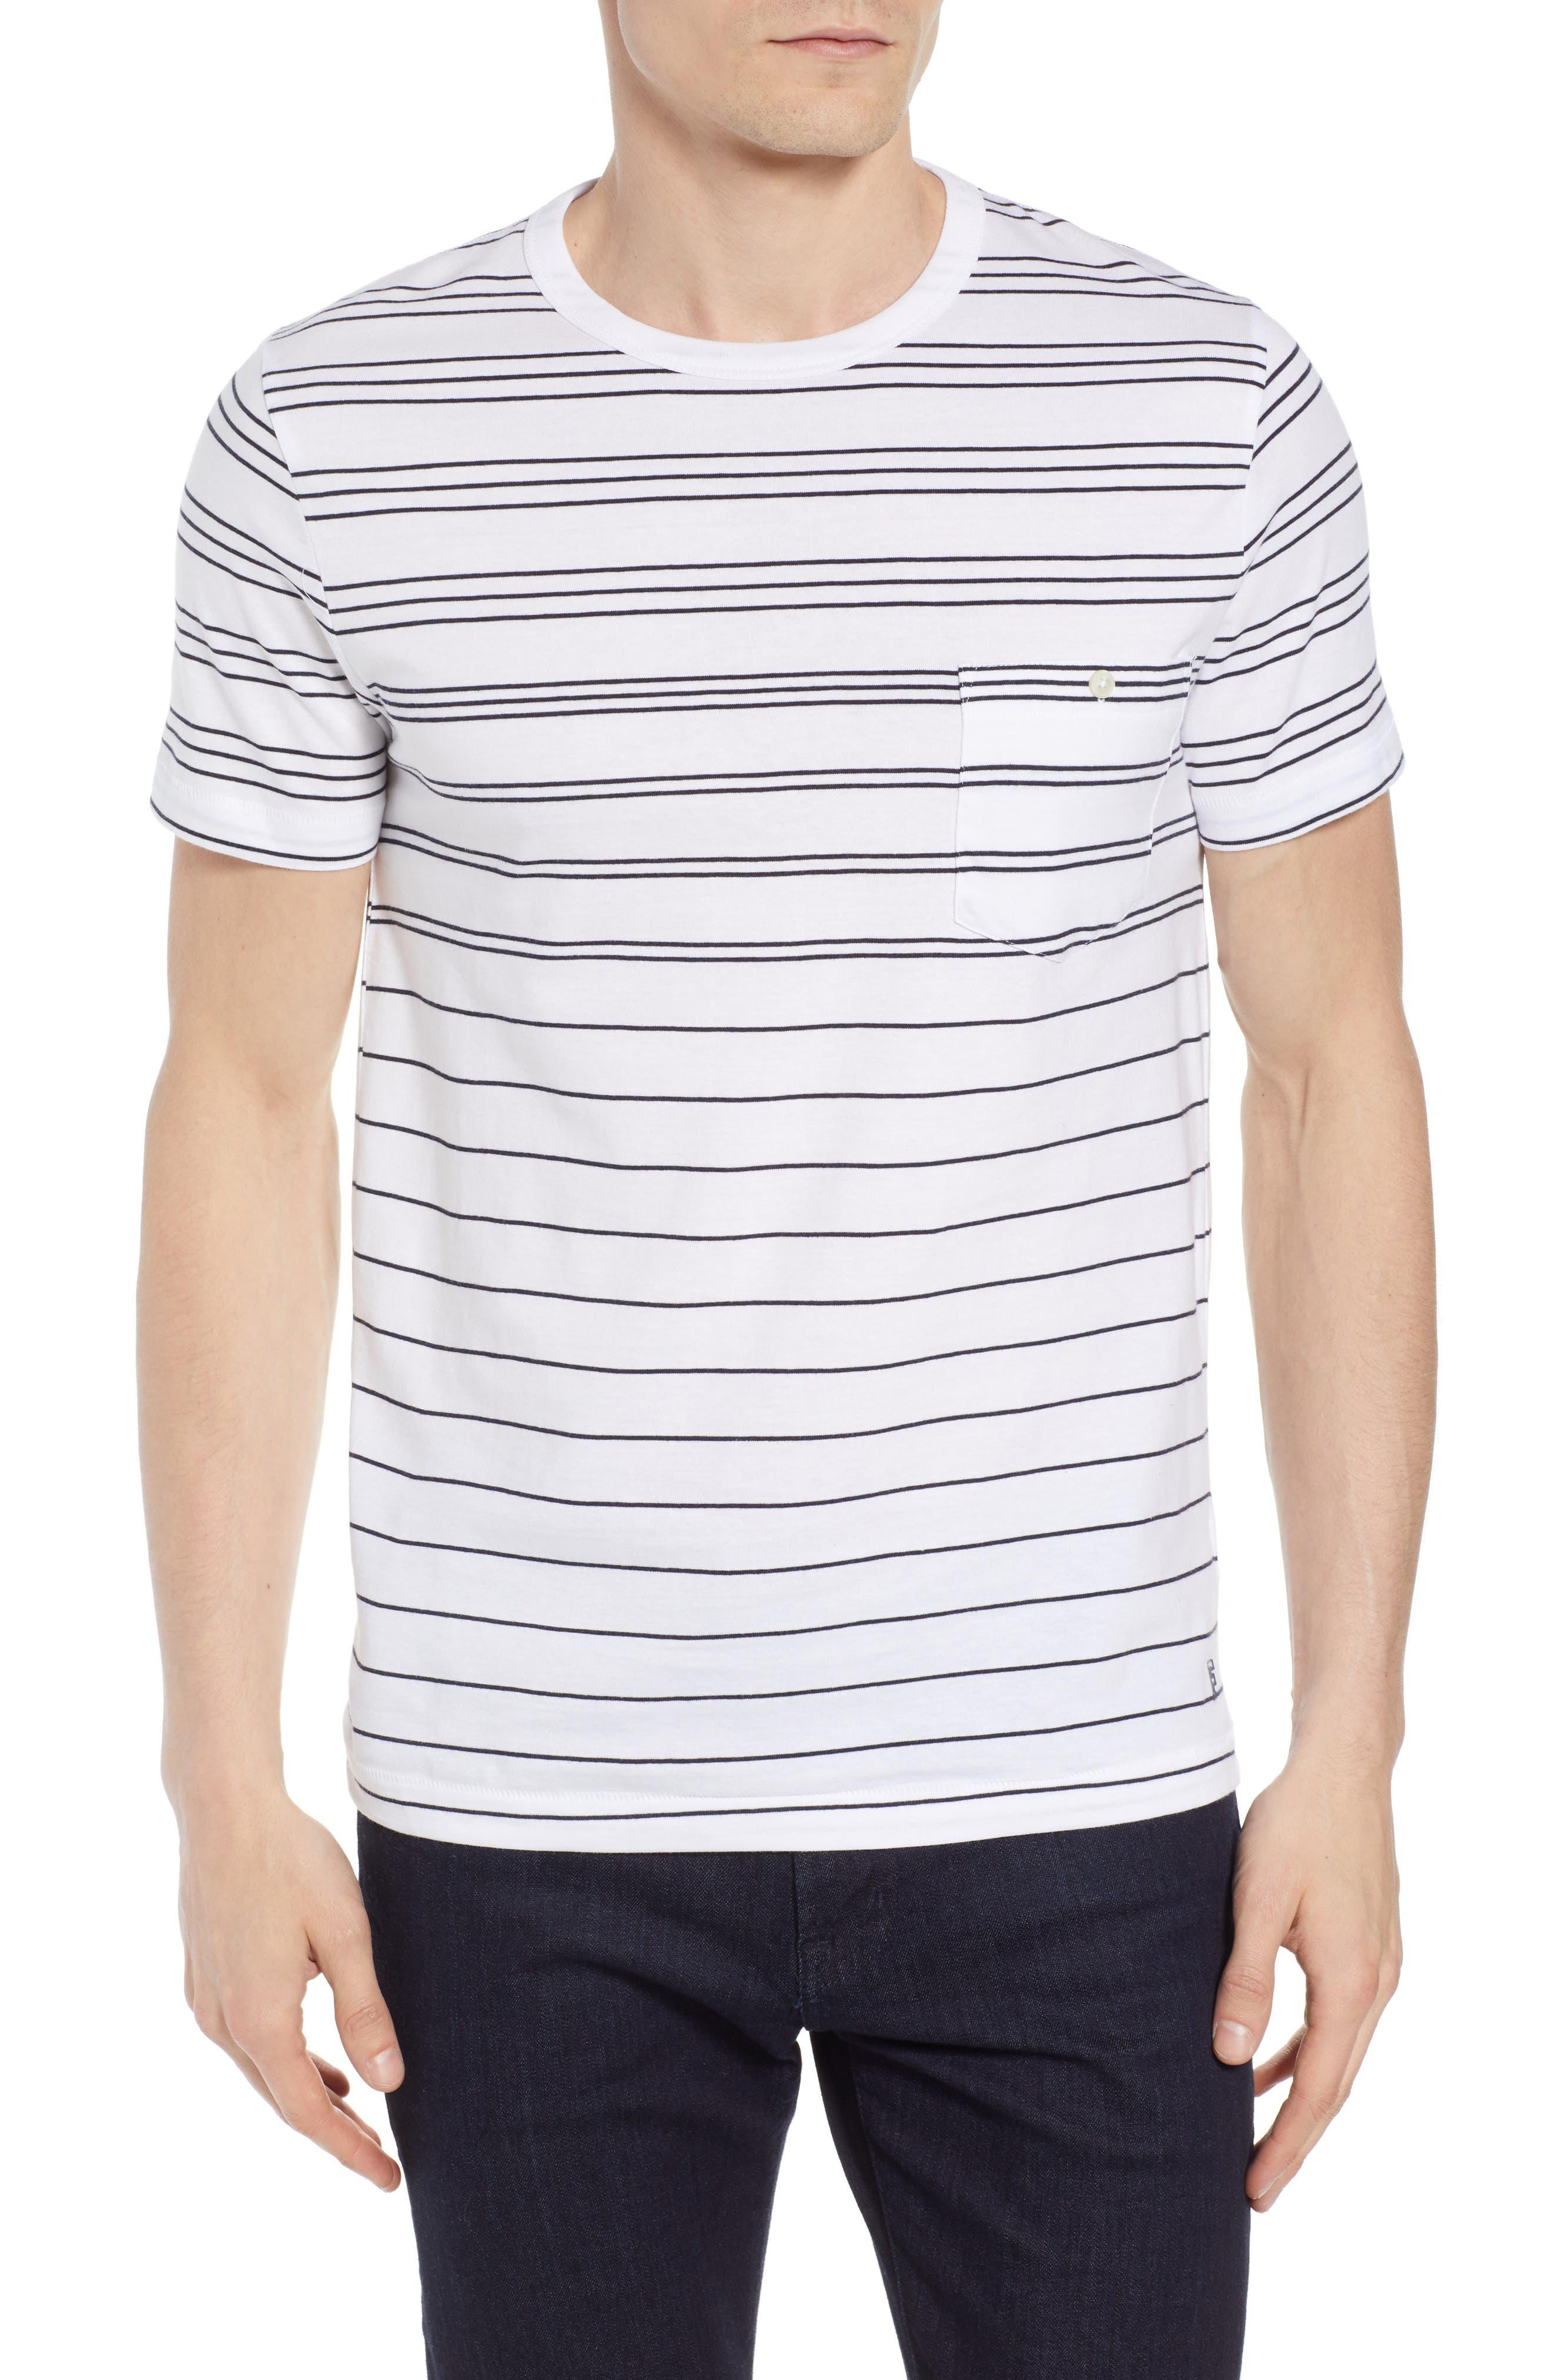 Summer Graded Stripe Pocket T-Shirt,                         Main,                         color, WHITE MARINE BLUE